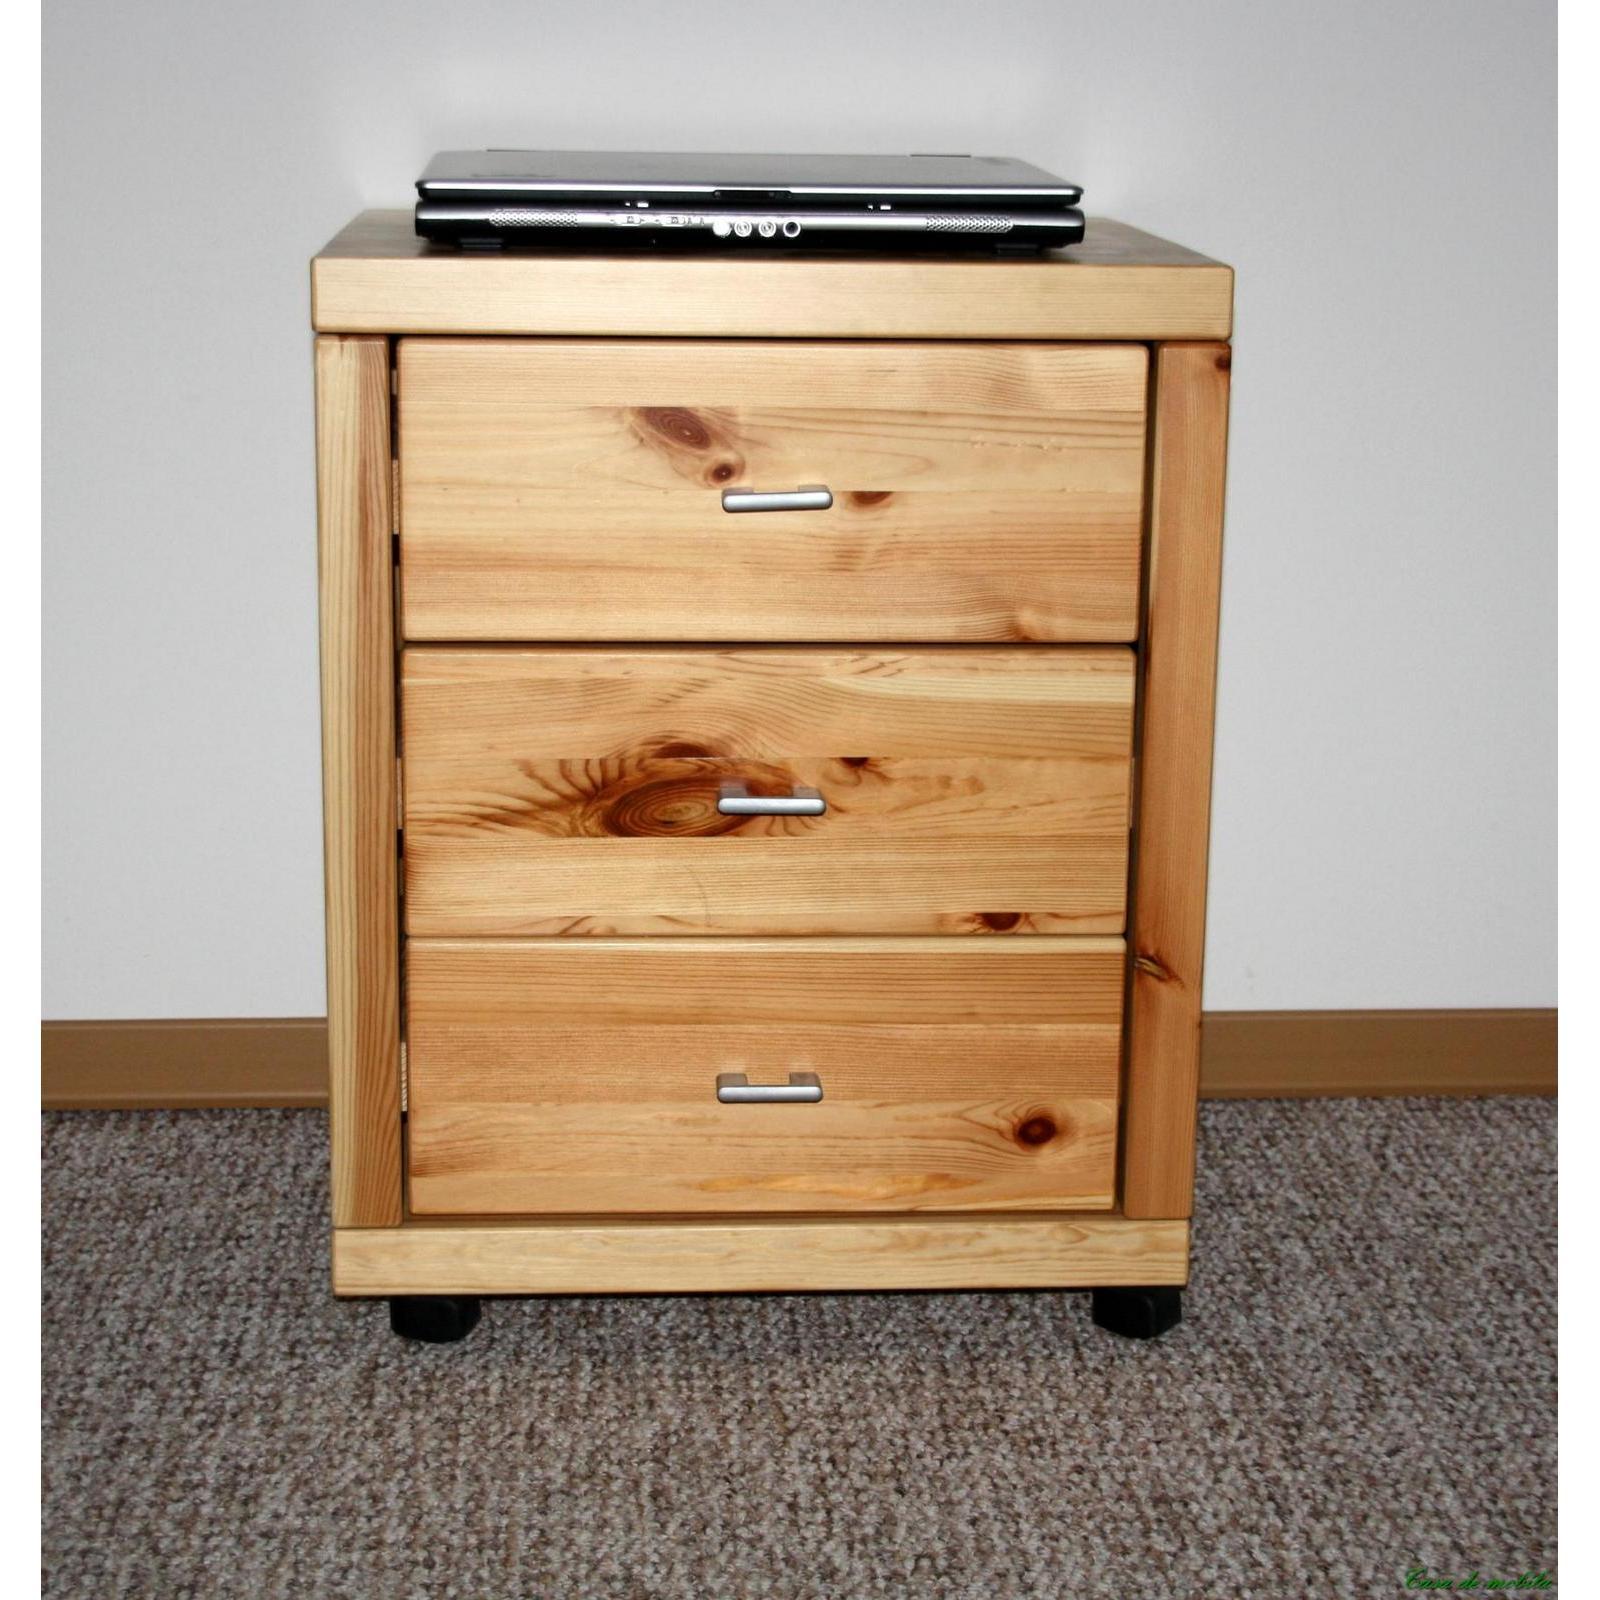 links 30600300 nils rollcontainer 36x40x65 cm 6 schubladen. Black Bedroom Furniture Sets. Home Design Ideas